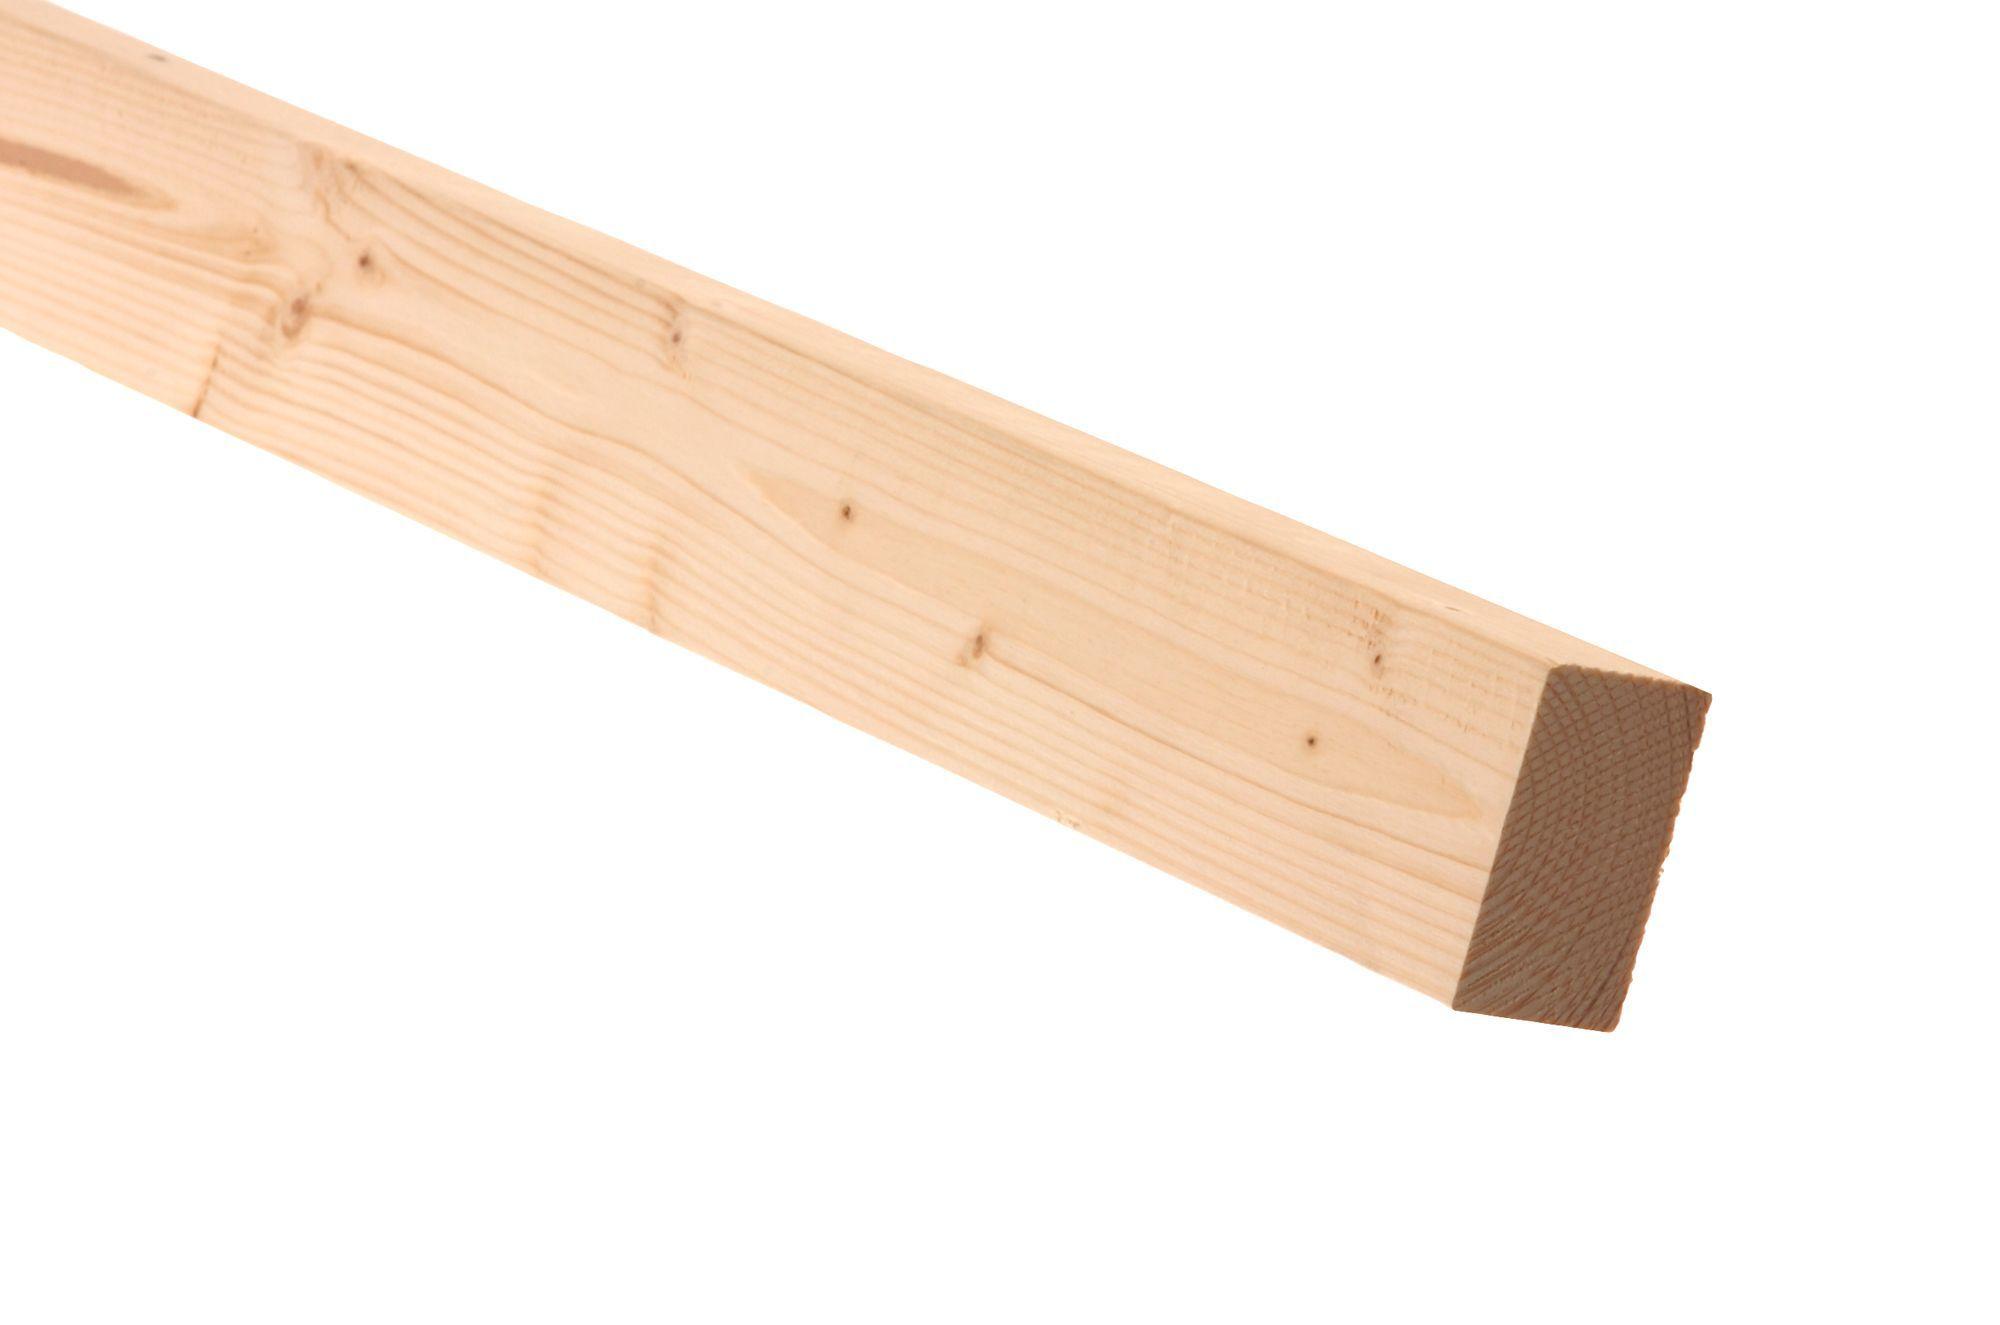 cls timber t 38mm w 89mm l 2400mm departments diy. Black Bedroom Furniture Sets. Home Design Ideas